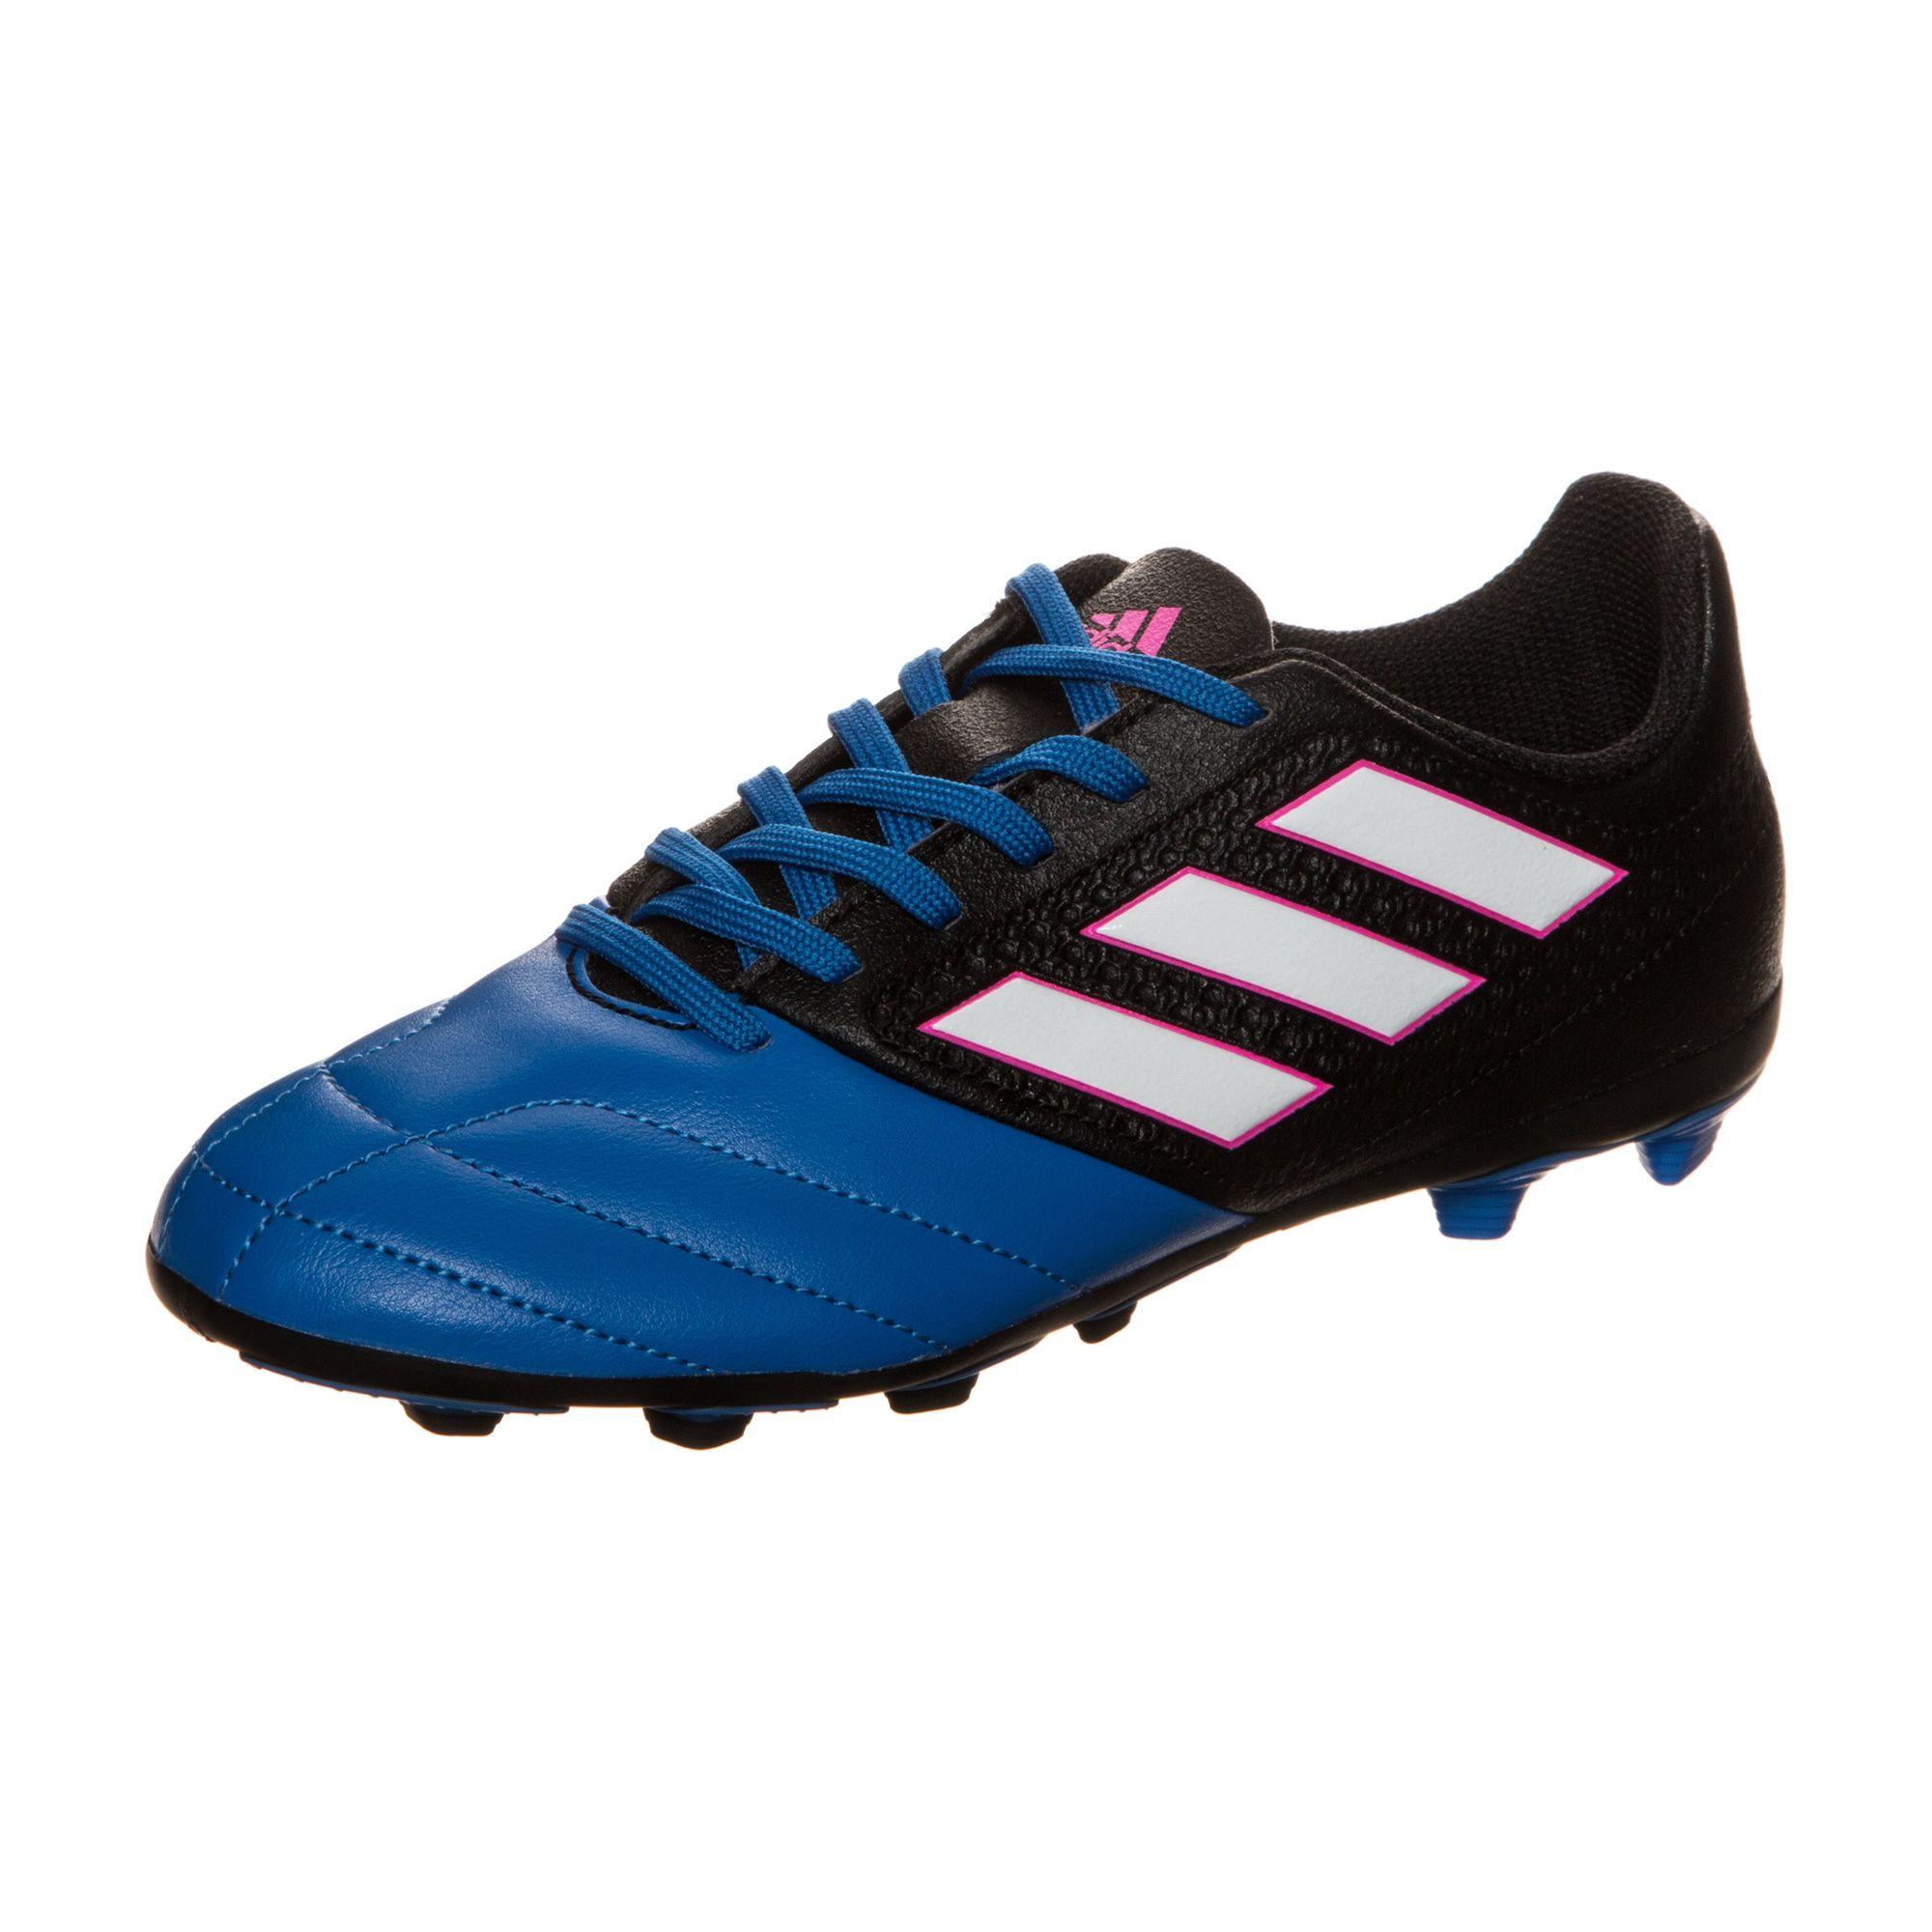 ADIDAS PERFORMANCE adidas Performance ACE 17.4 FxG Fußballschuh Kinder